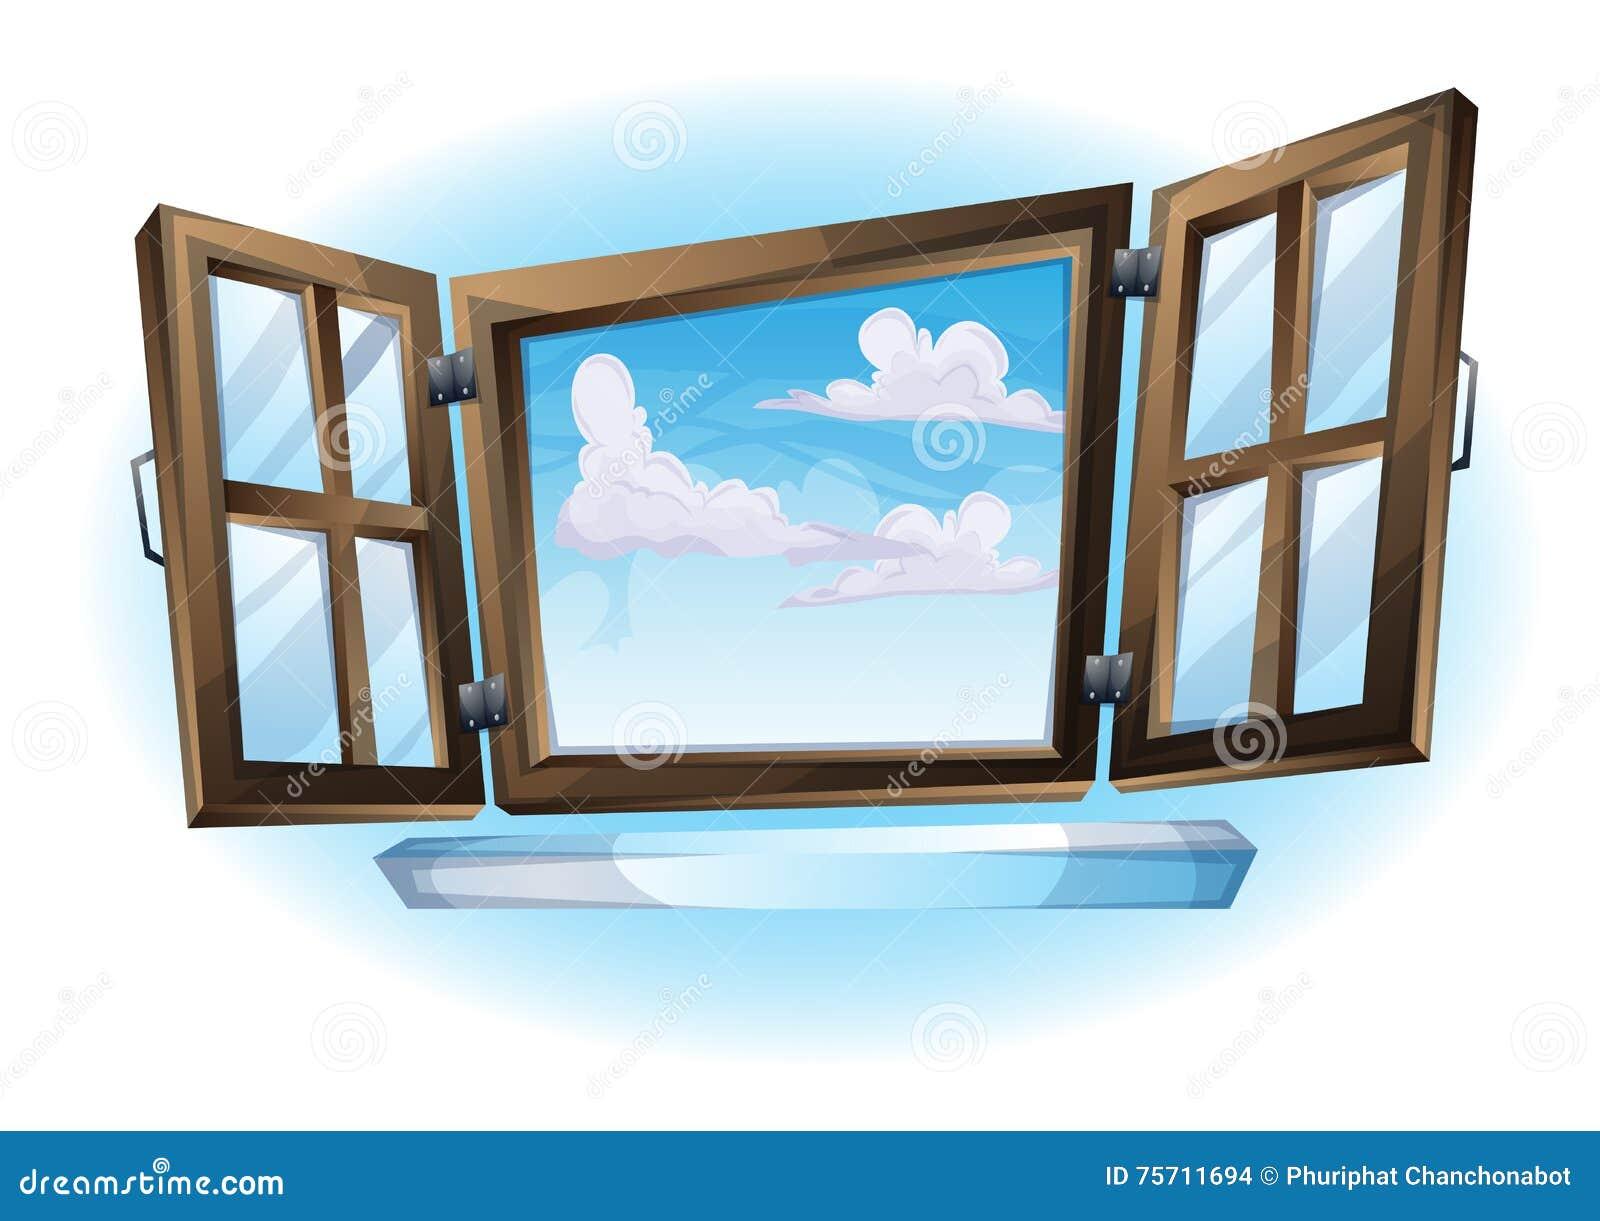 Cartoon Vector Illustration Window Open Landscape View Stock